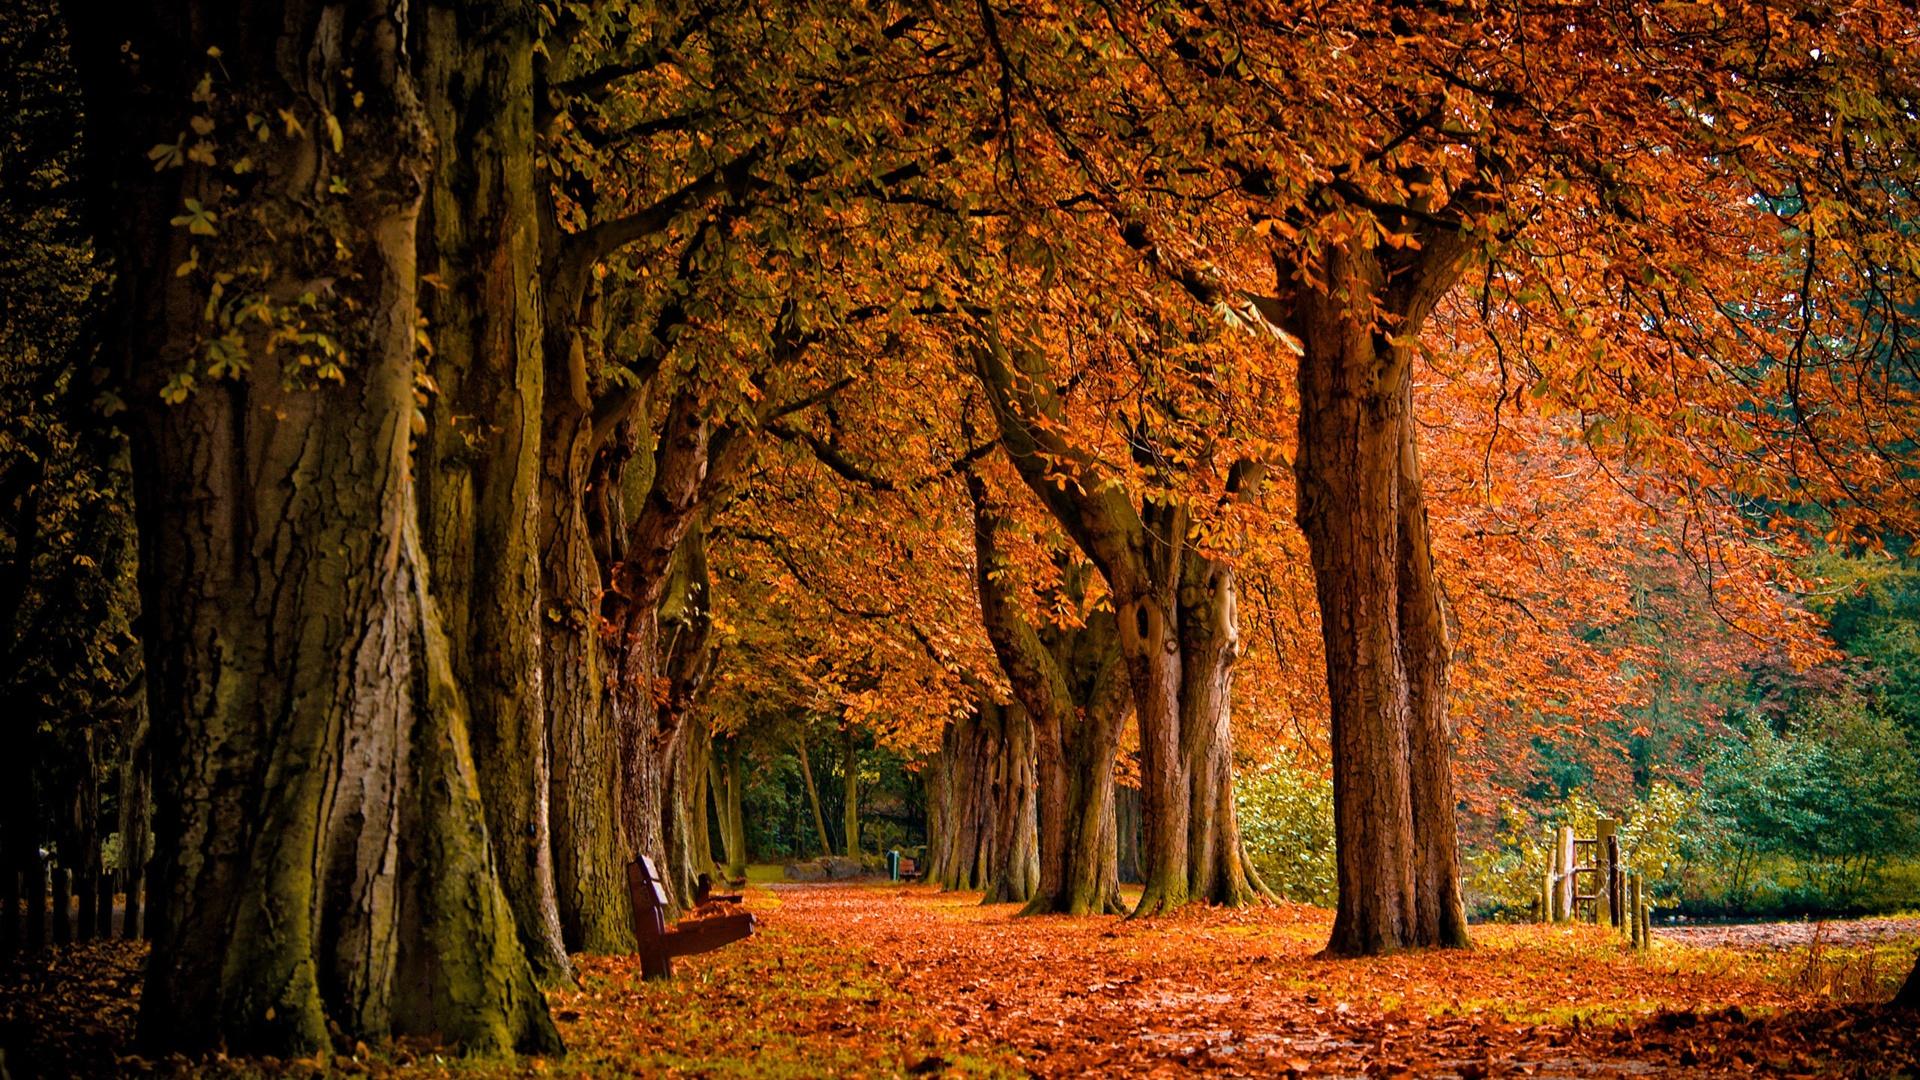 autumn park wallpaper 1920x1080 - photo #18